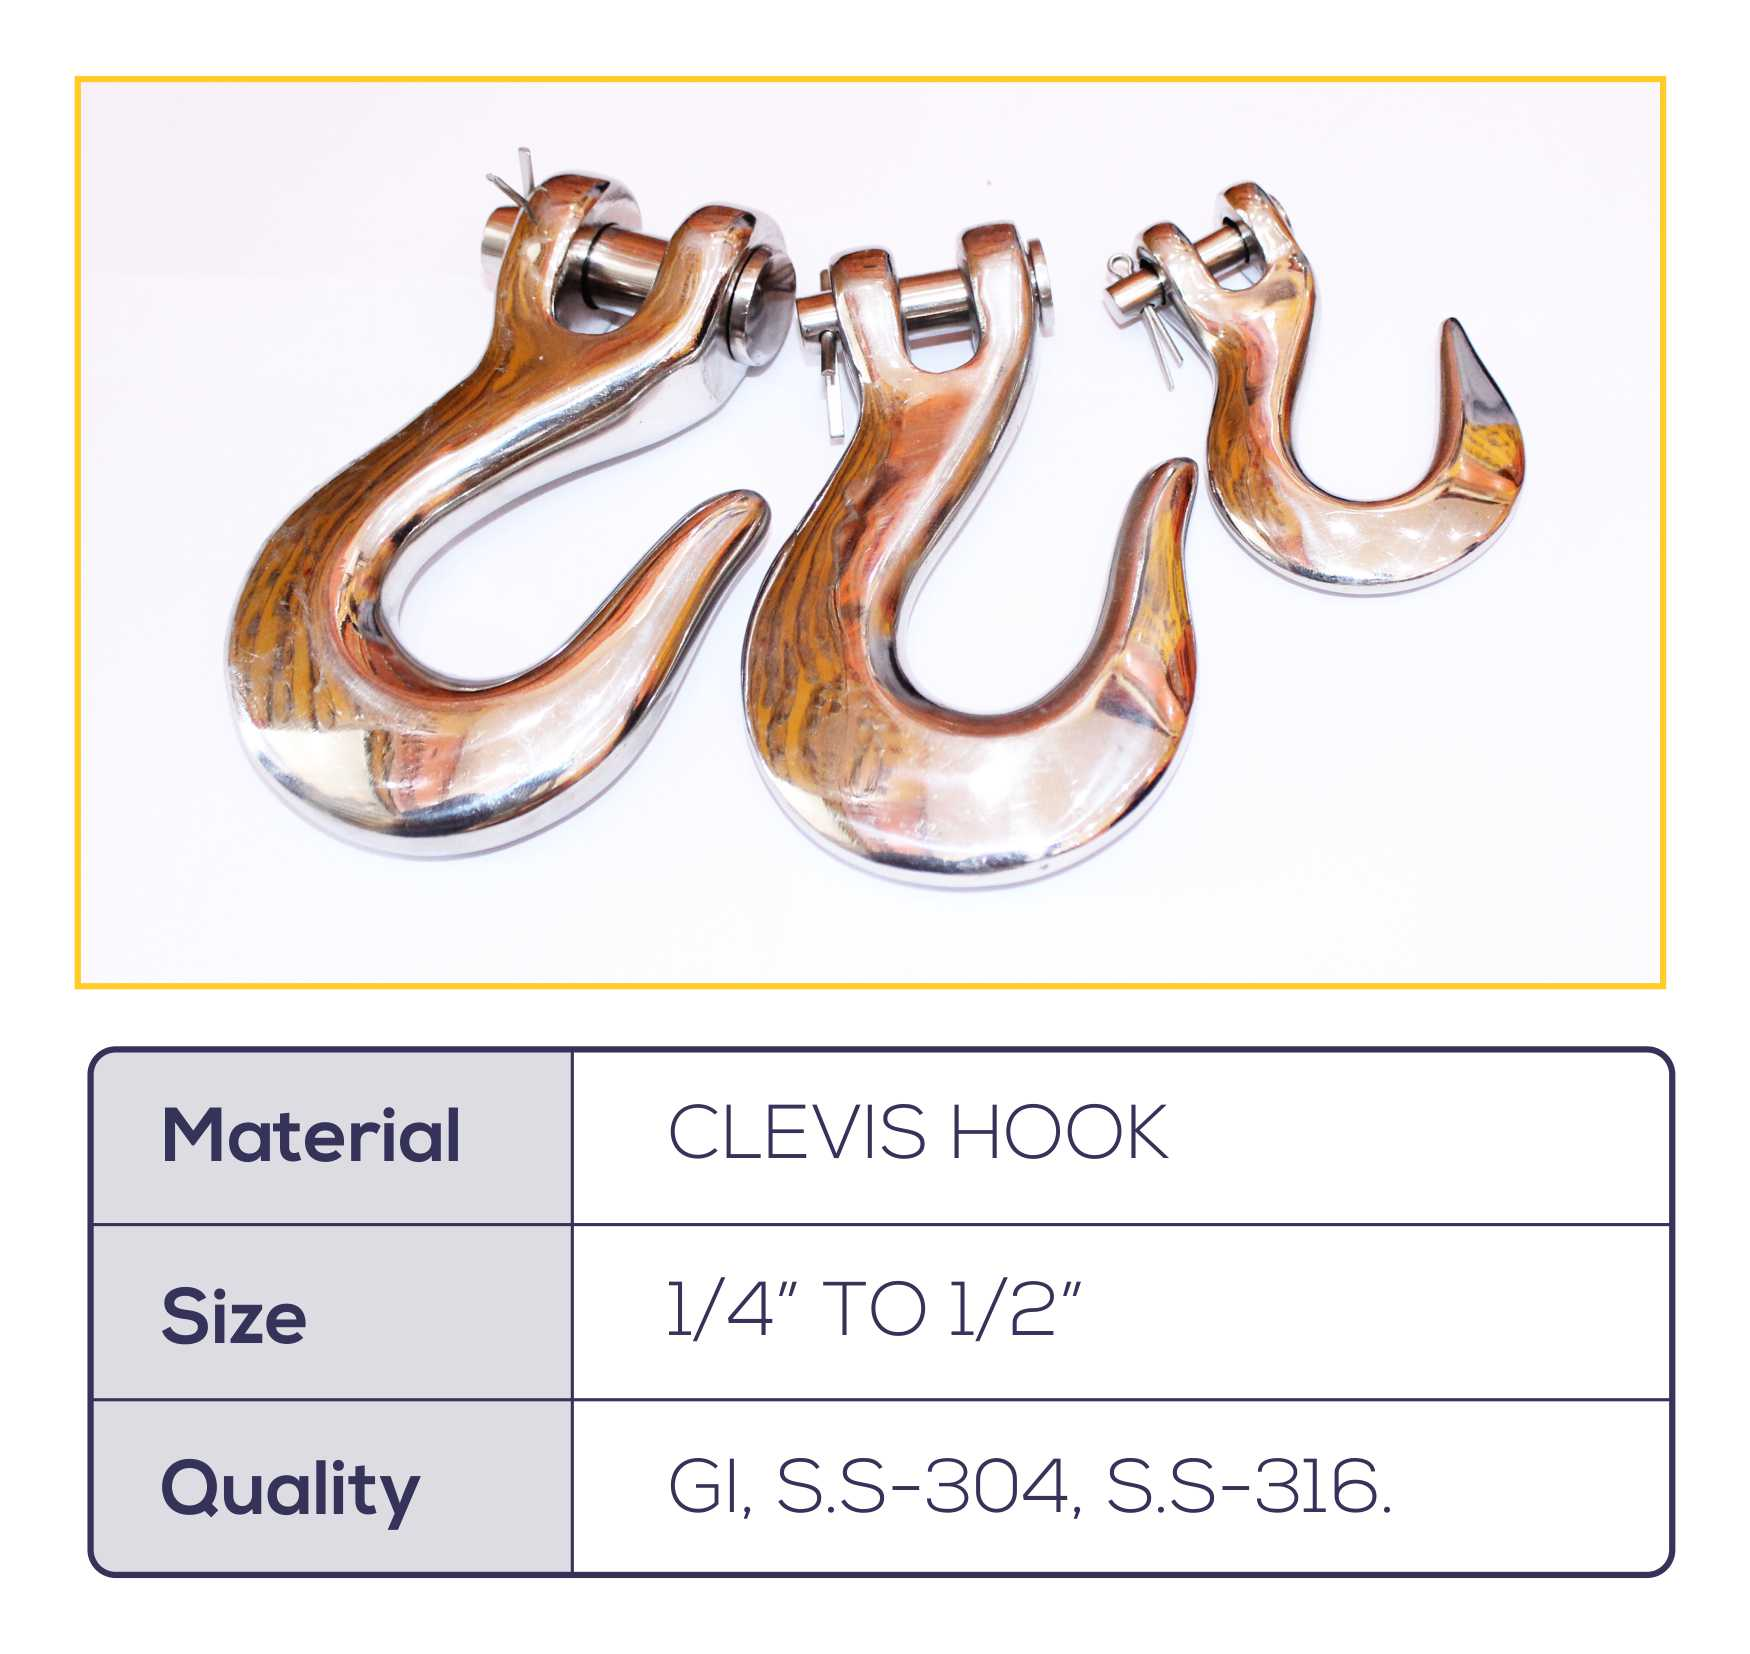 Clevis Hook